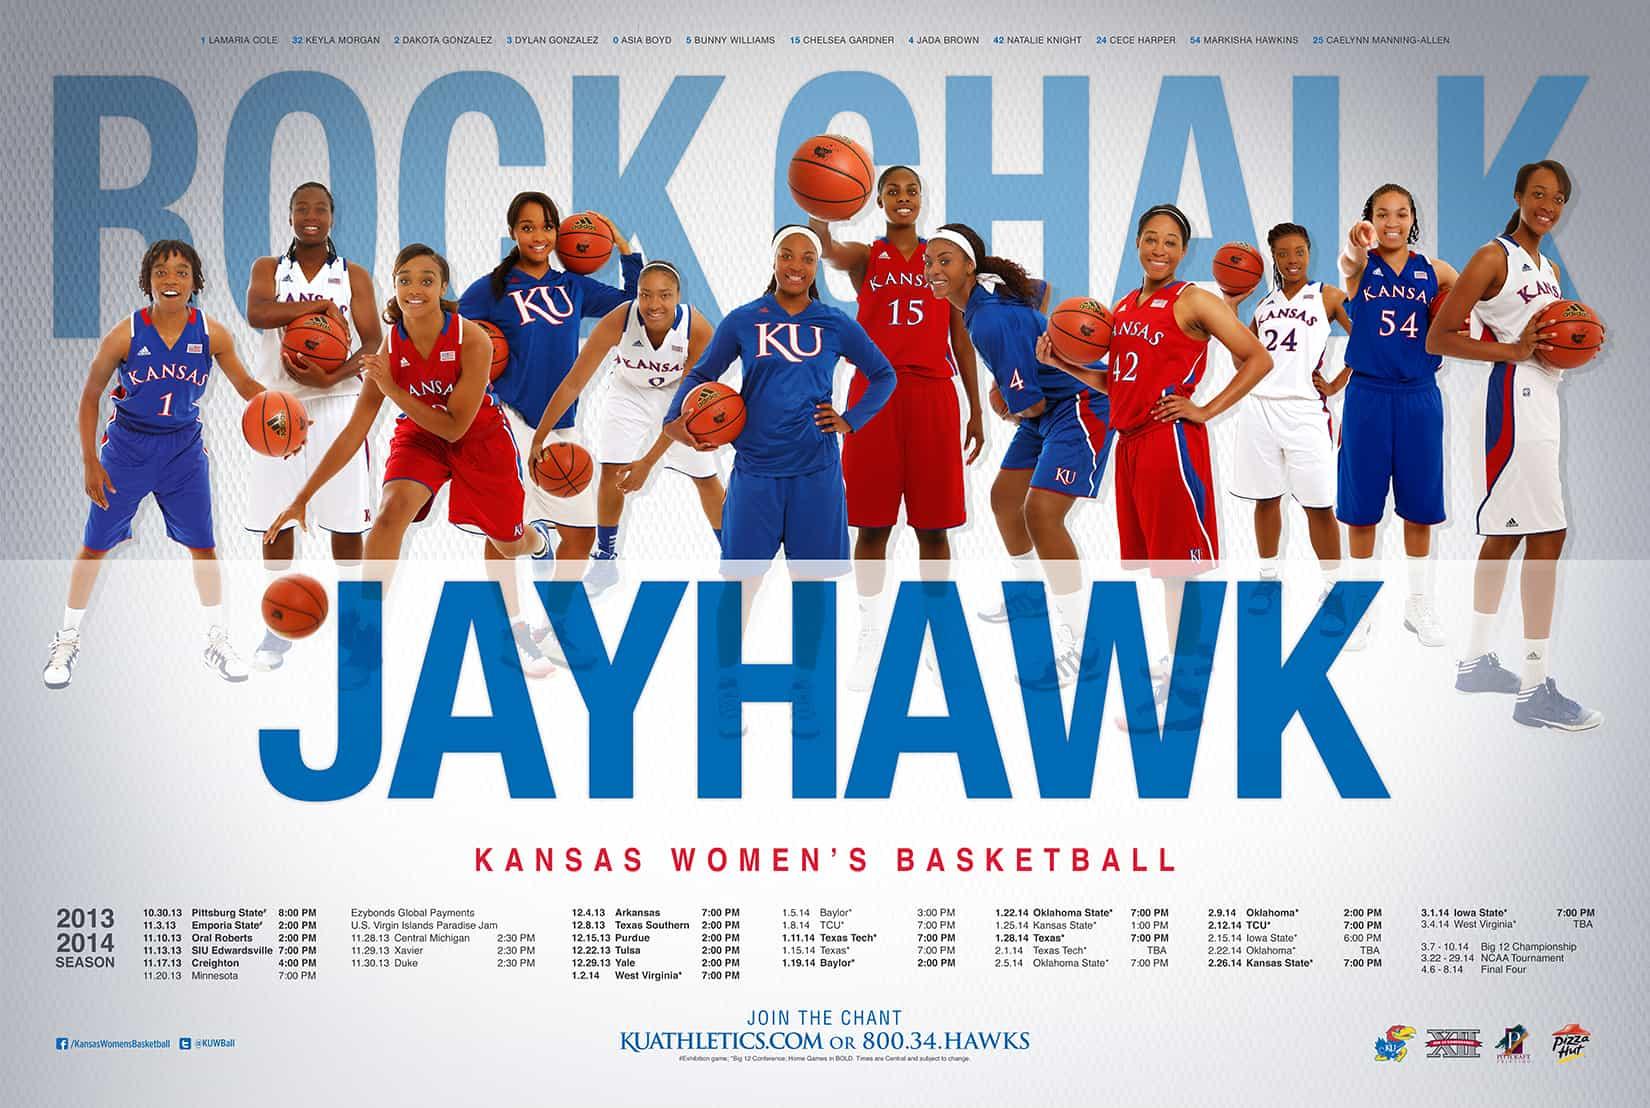 Kansas Jayhawks 2017 2017 Roster